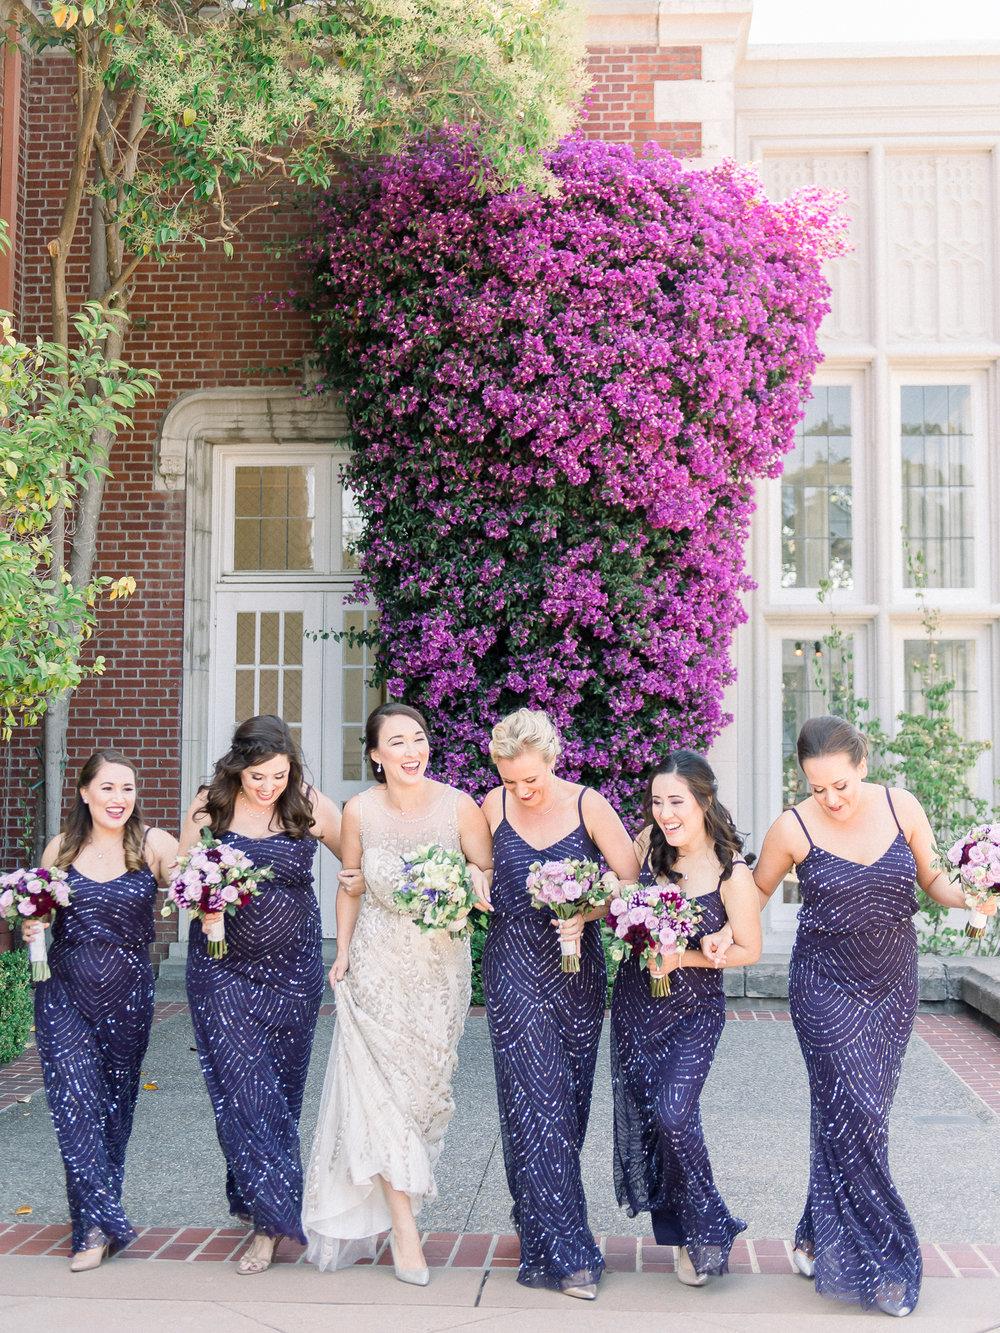 Sarah+Warren_wedding_spp-59.jpg